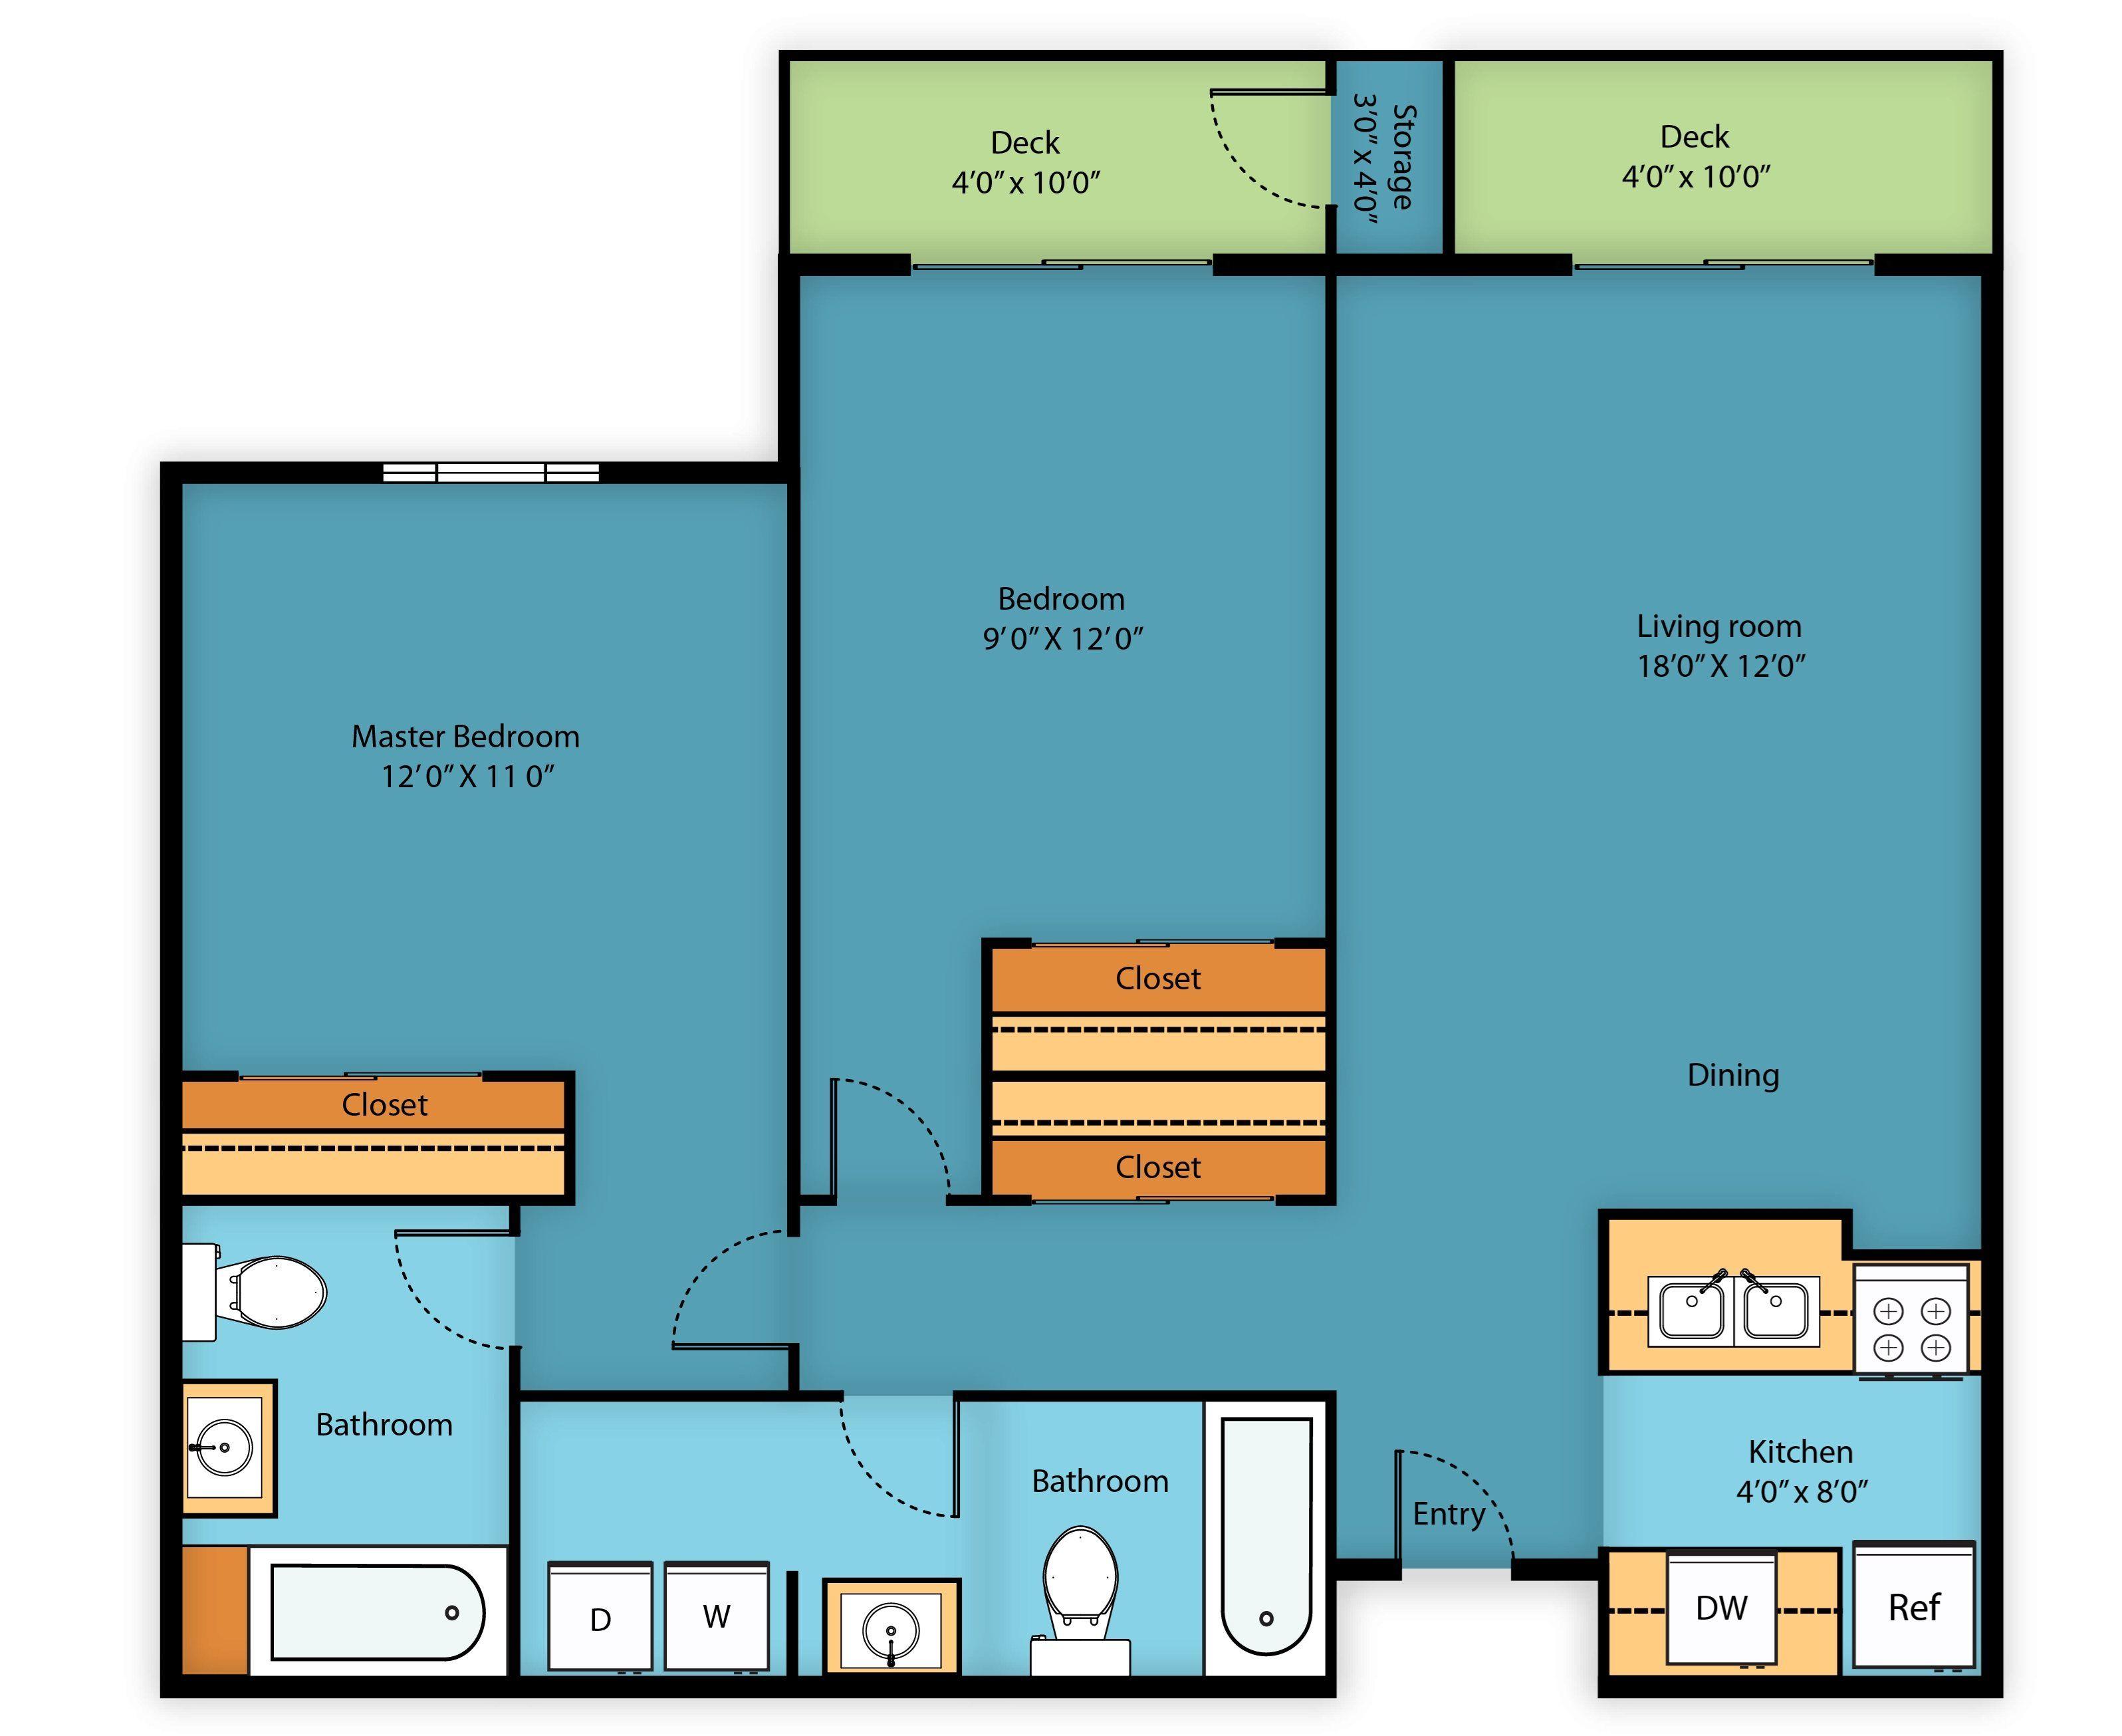 2 Bedroom 2 Bath 980 Sq Ft Floor Plans Kitchens Bathrooms How To Plan